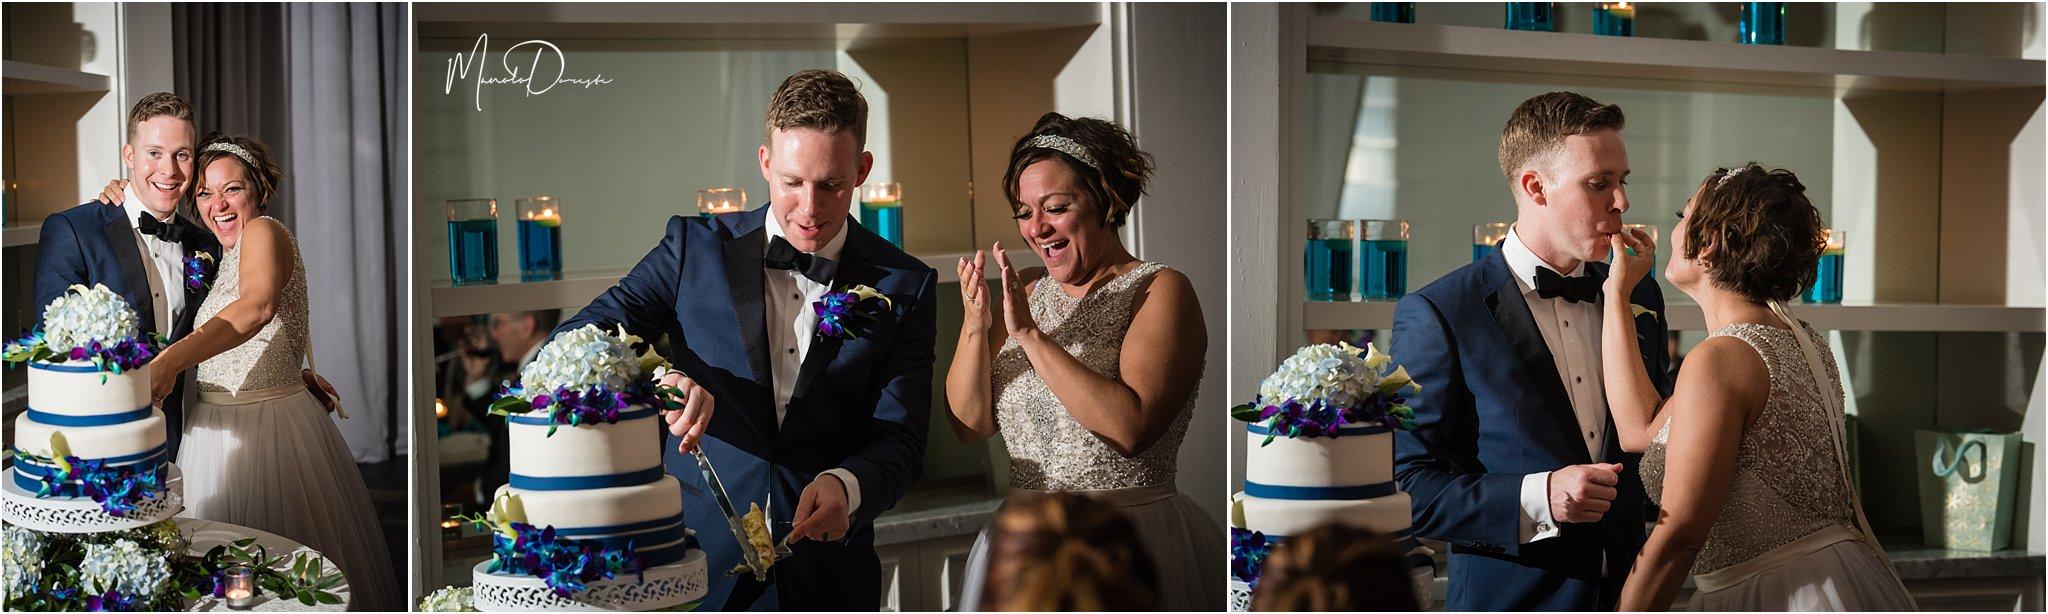 0460_ManoloDoreste_InFocusStudios_Wedding_Family_Photography_Miami_MiamiPhotographer.jpg